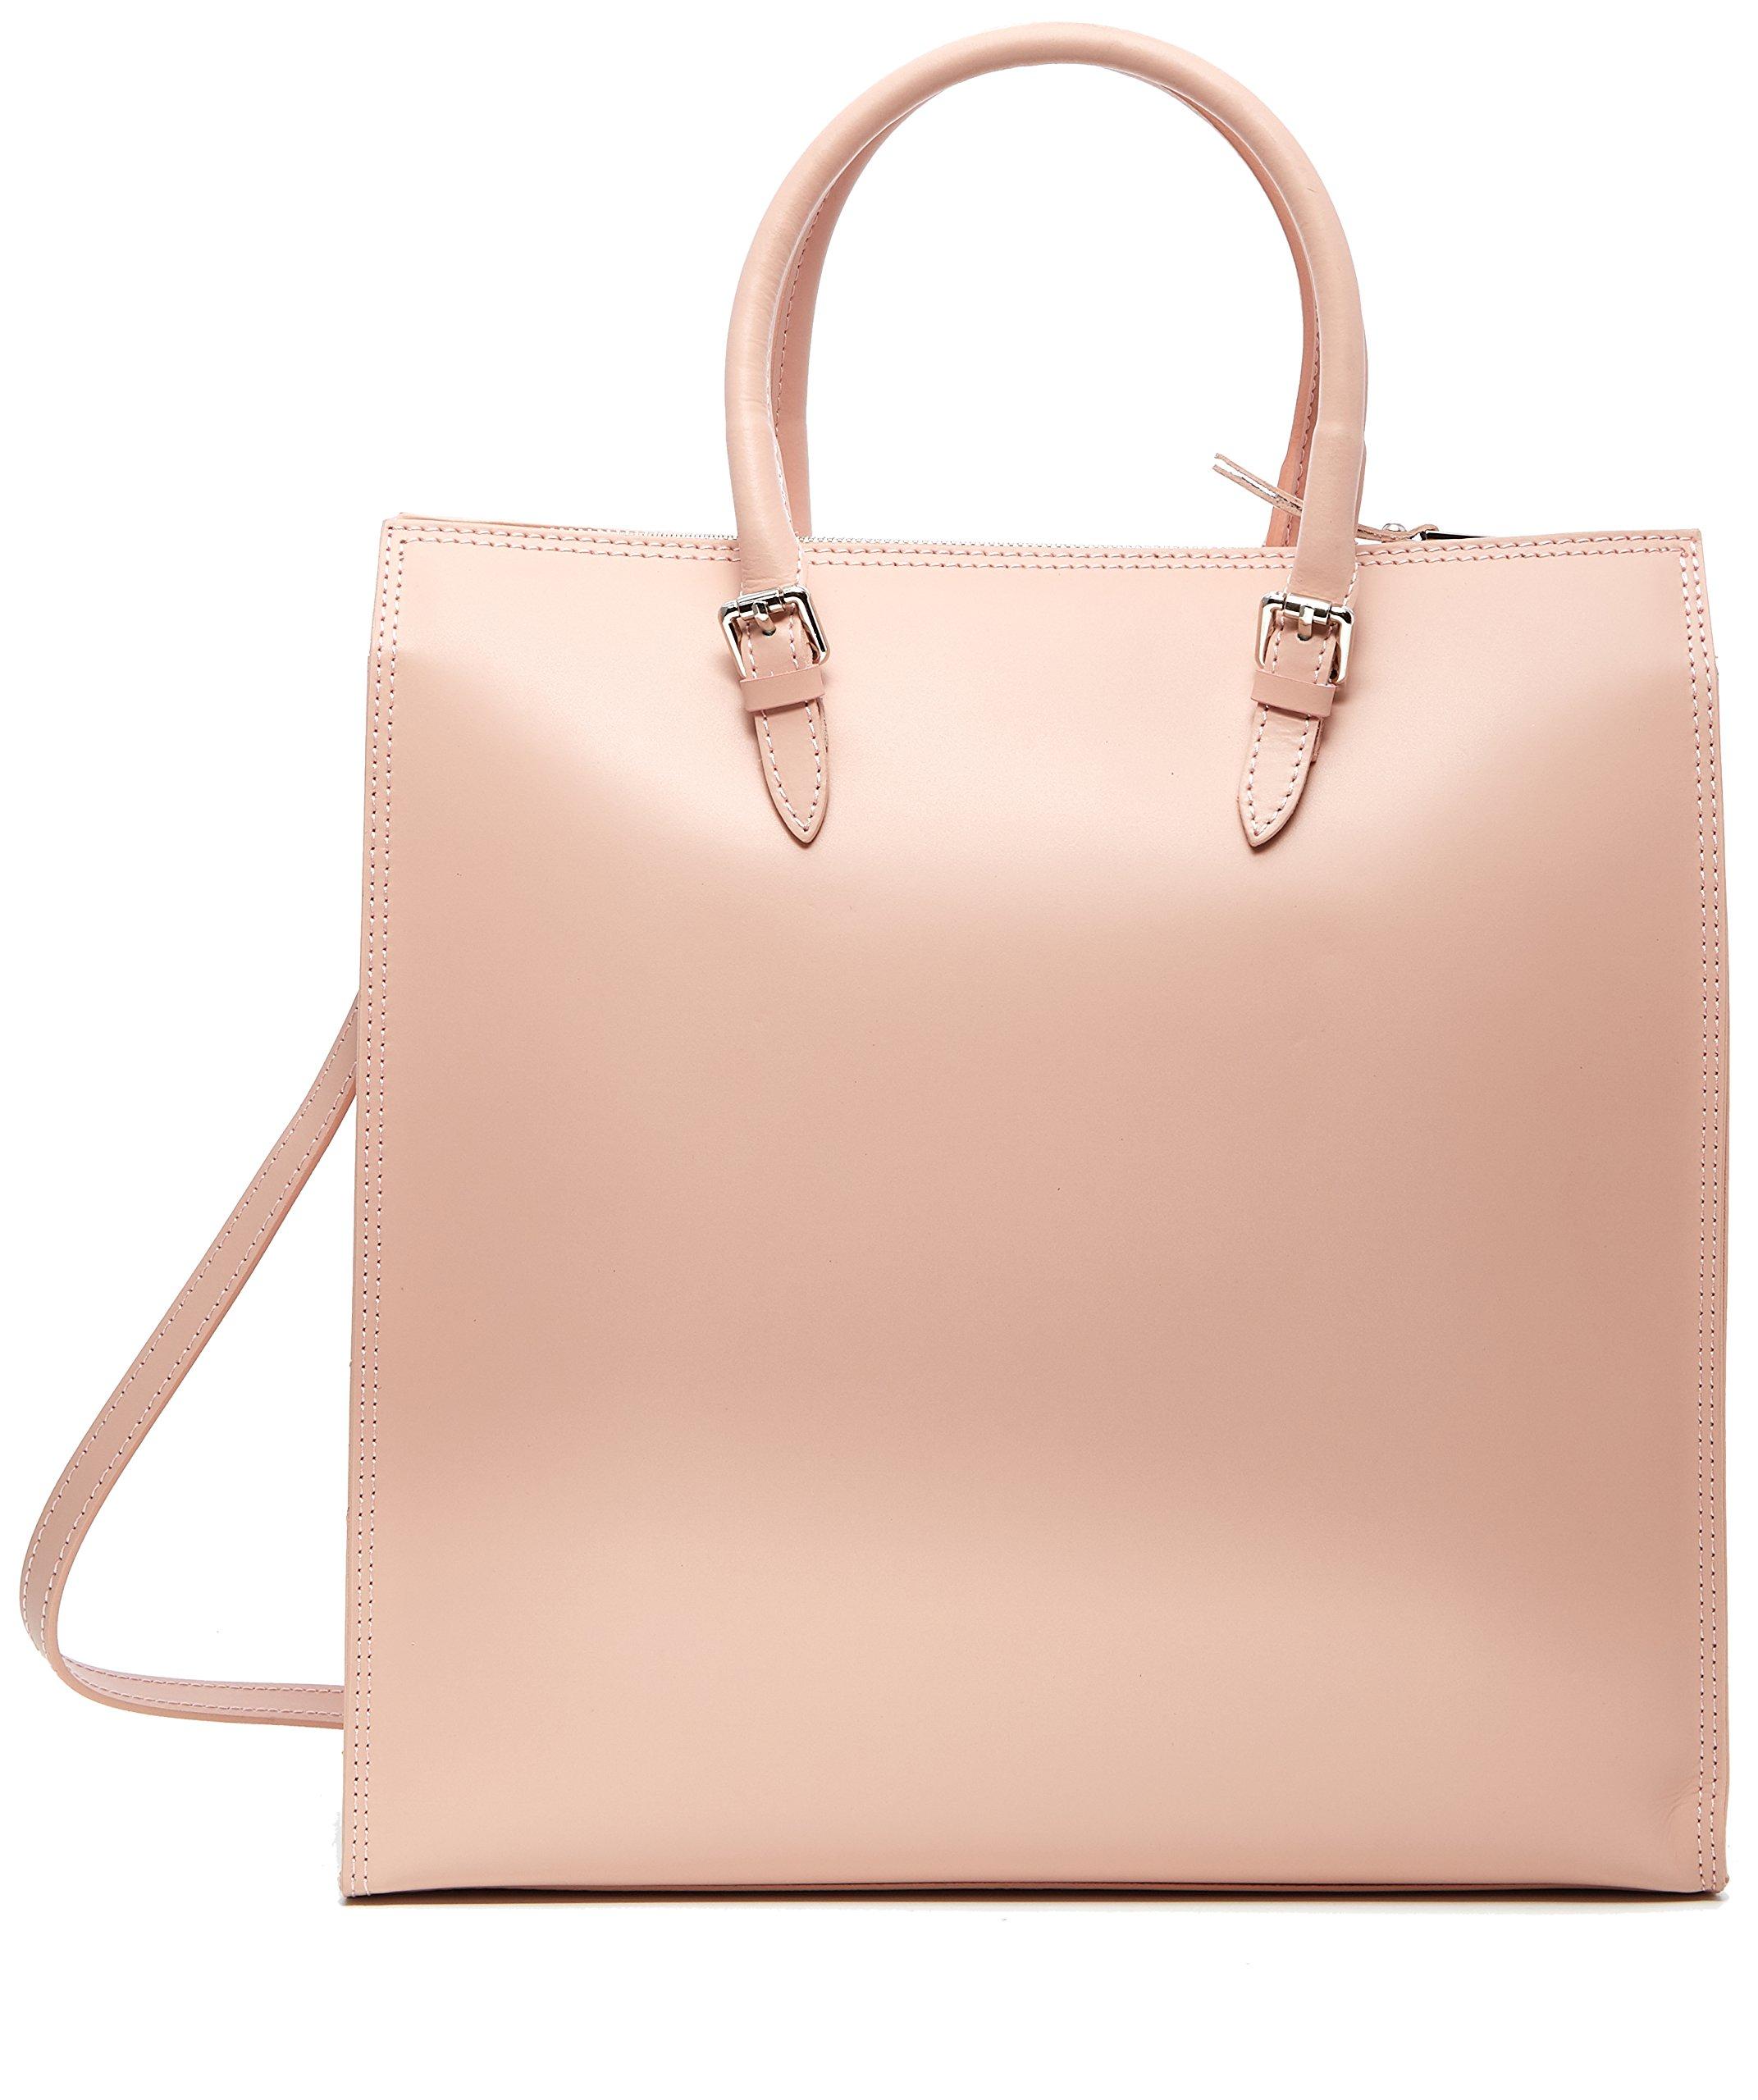 Cmw BorseSac Chicca H FemmeRosepink À X Main Pink35x36x12 LEu Tl3u1FcKJ5